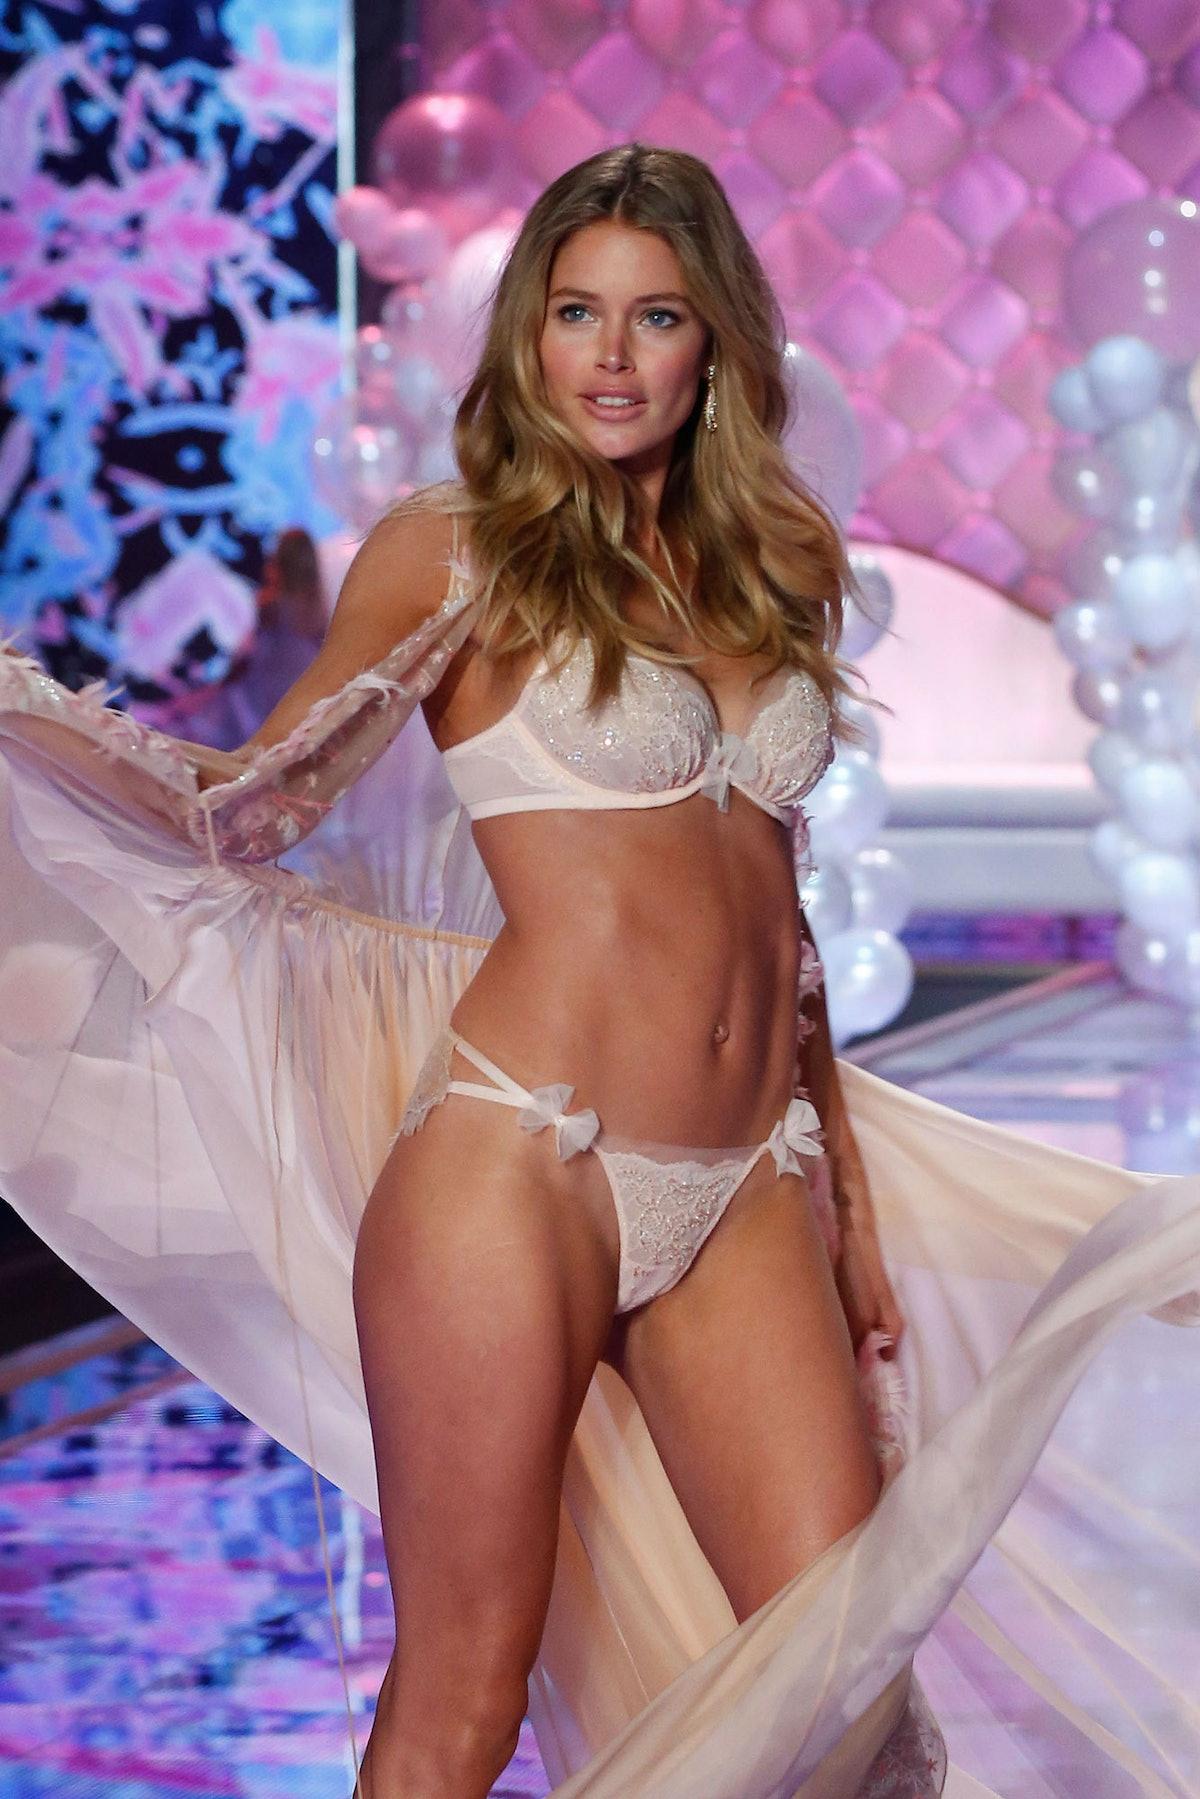 Doutzen Kroes walks in the 2014 Victoria's Secret Fashion Show